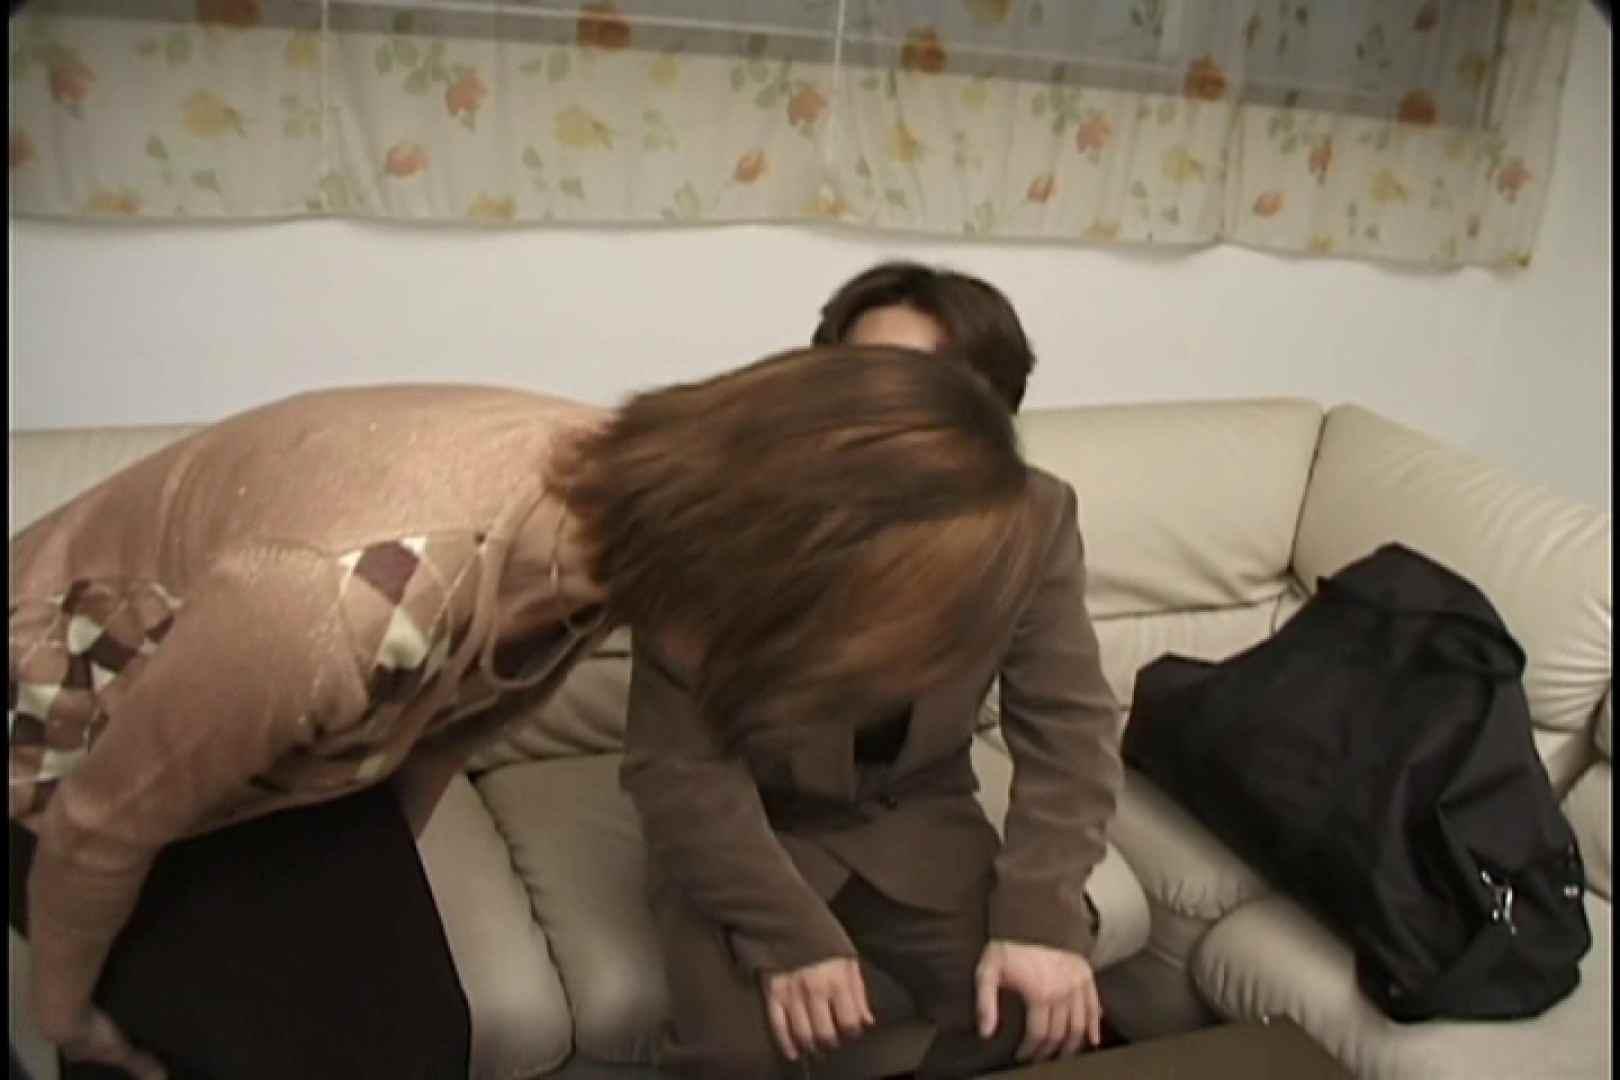 昼間の奥様は欲求不満 ~石川麻紀~ 熟女  111連発 10